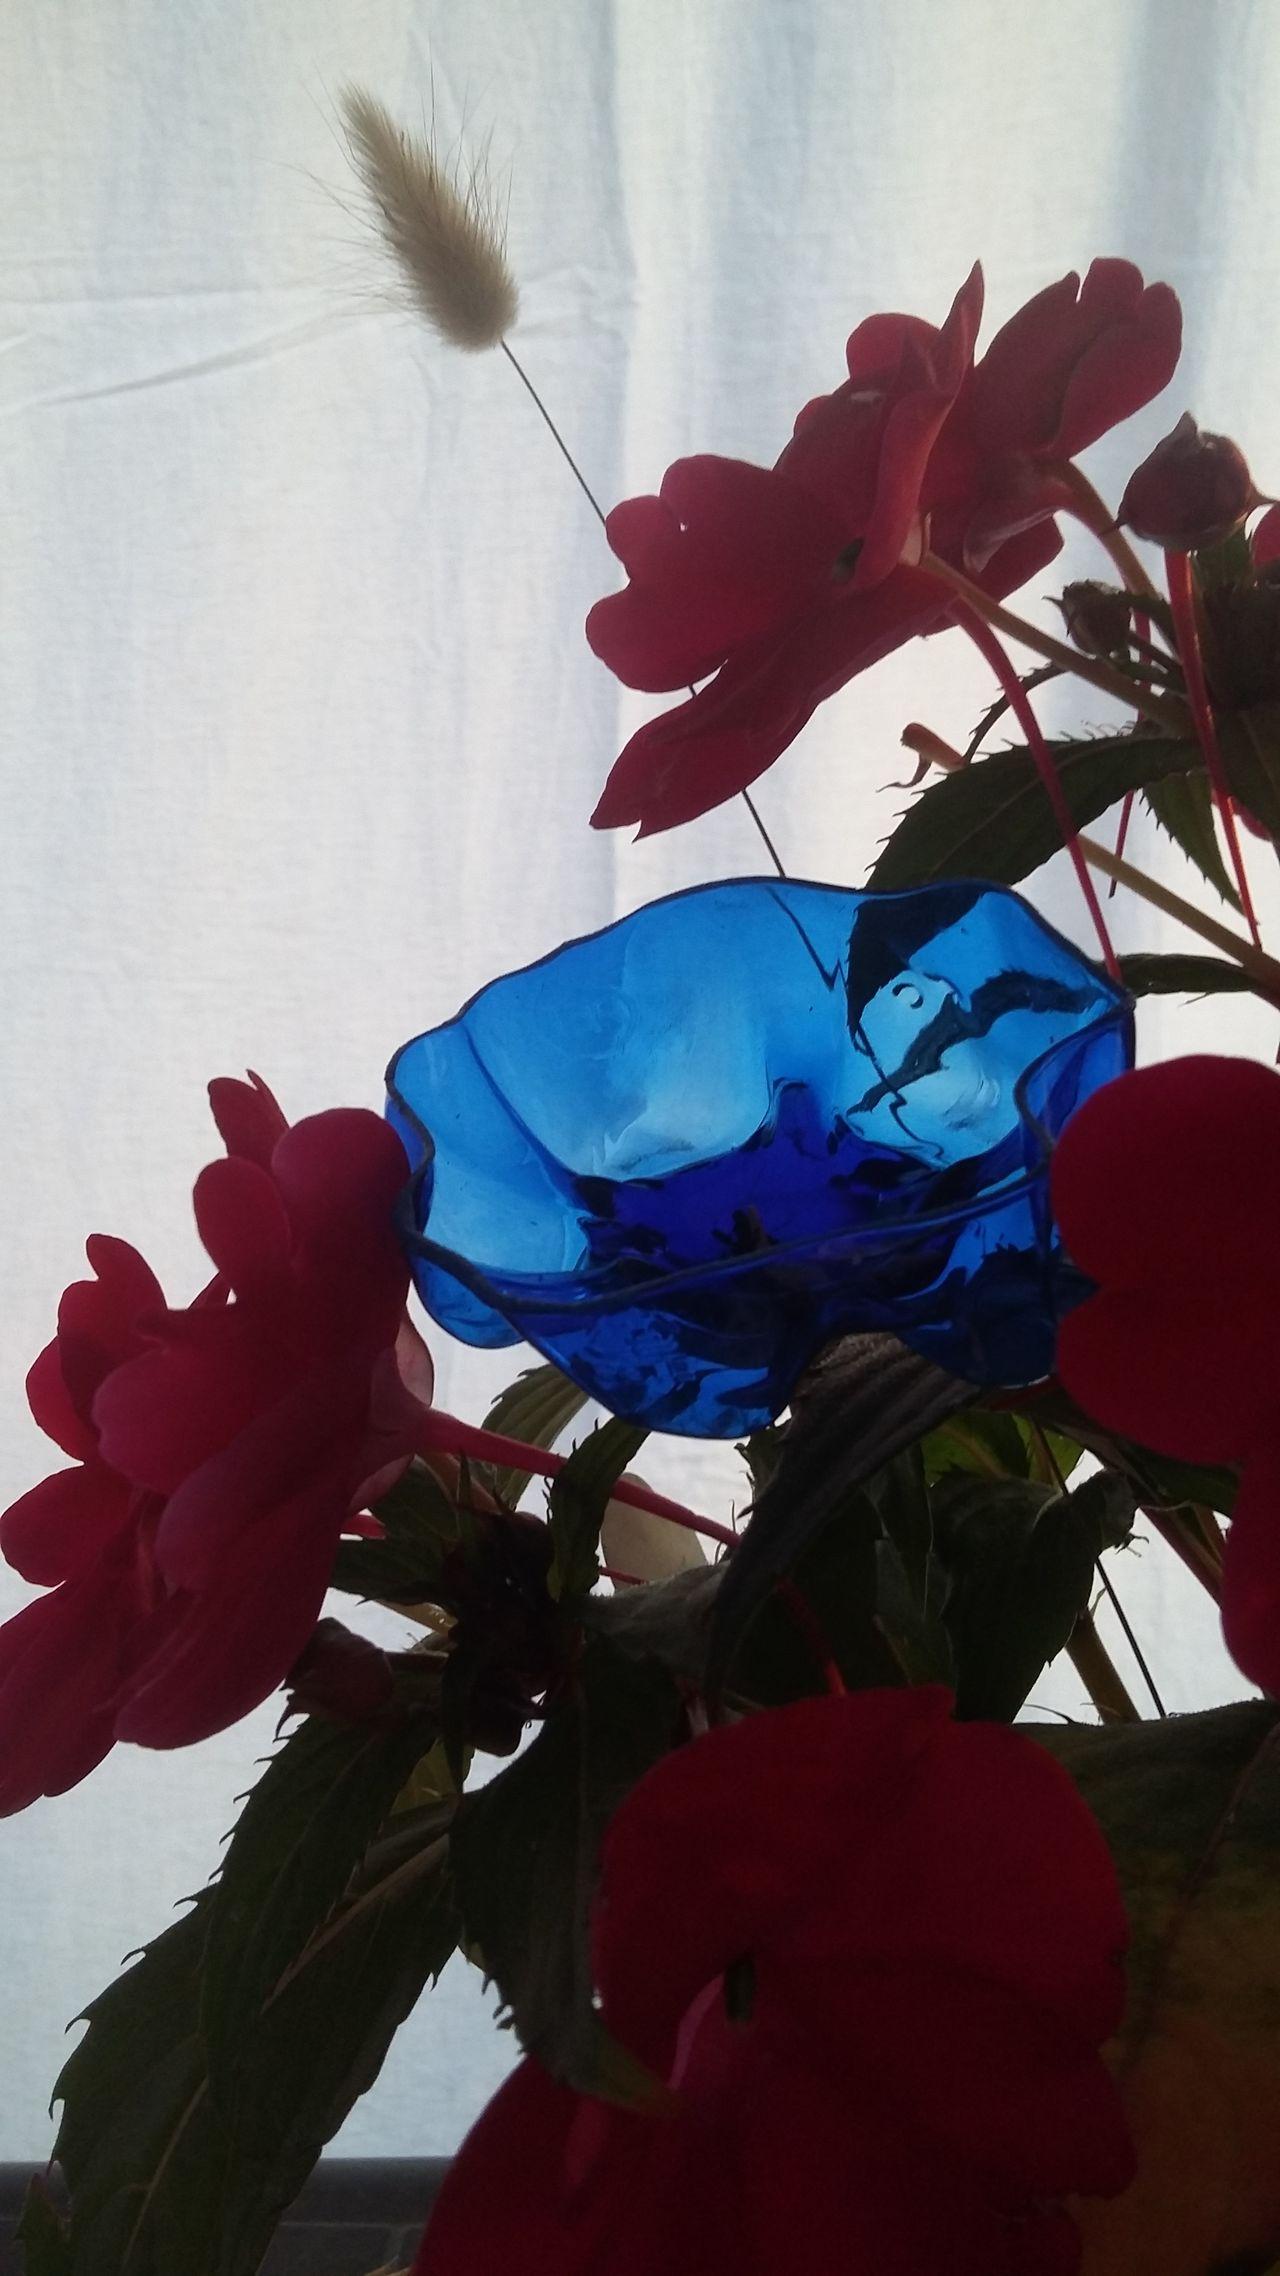 J'aime les fleurs 🌼 Flower Blue Red Nature Close-up Outside Art No People